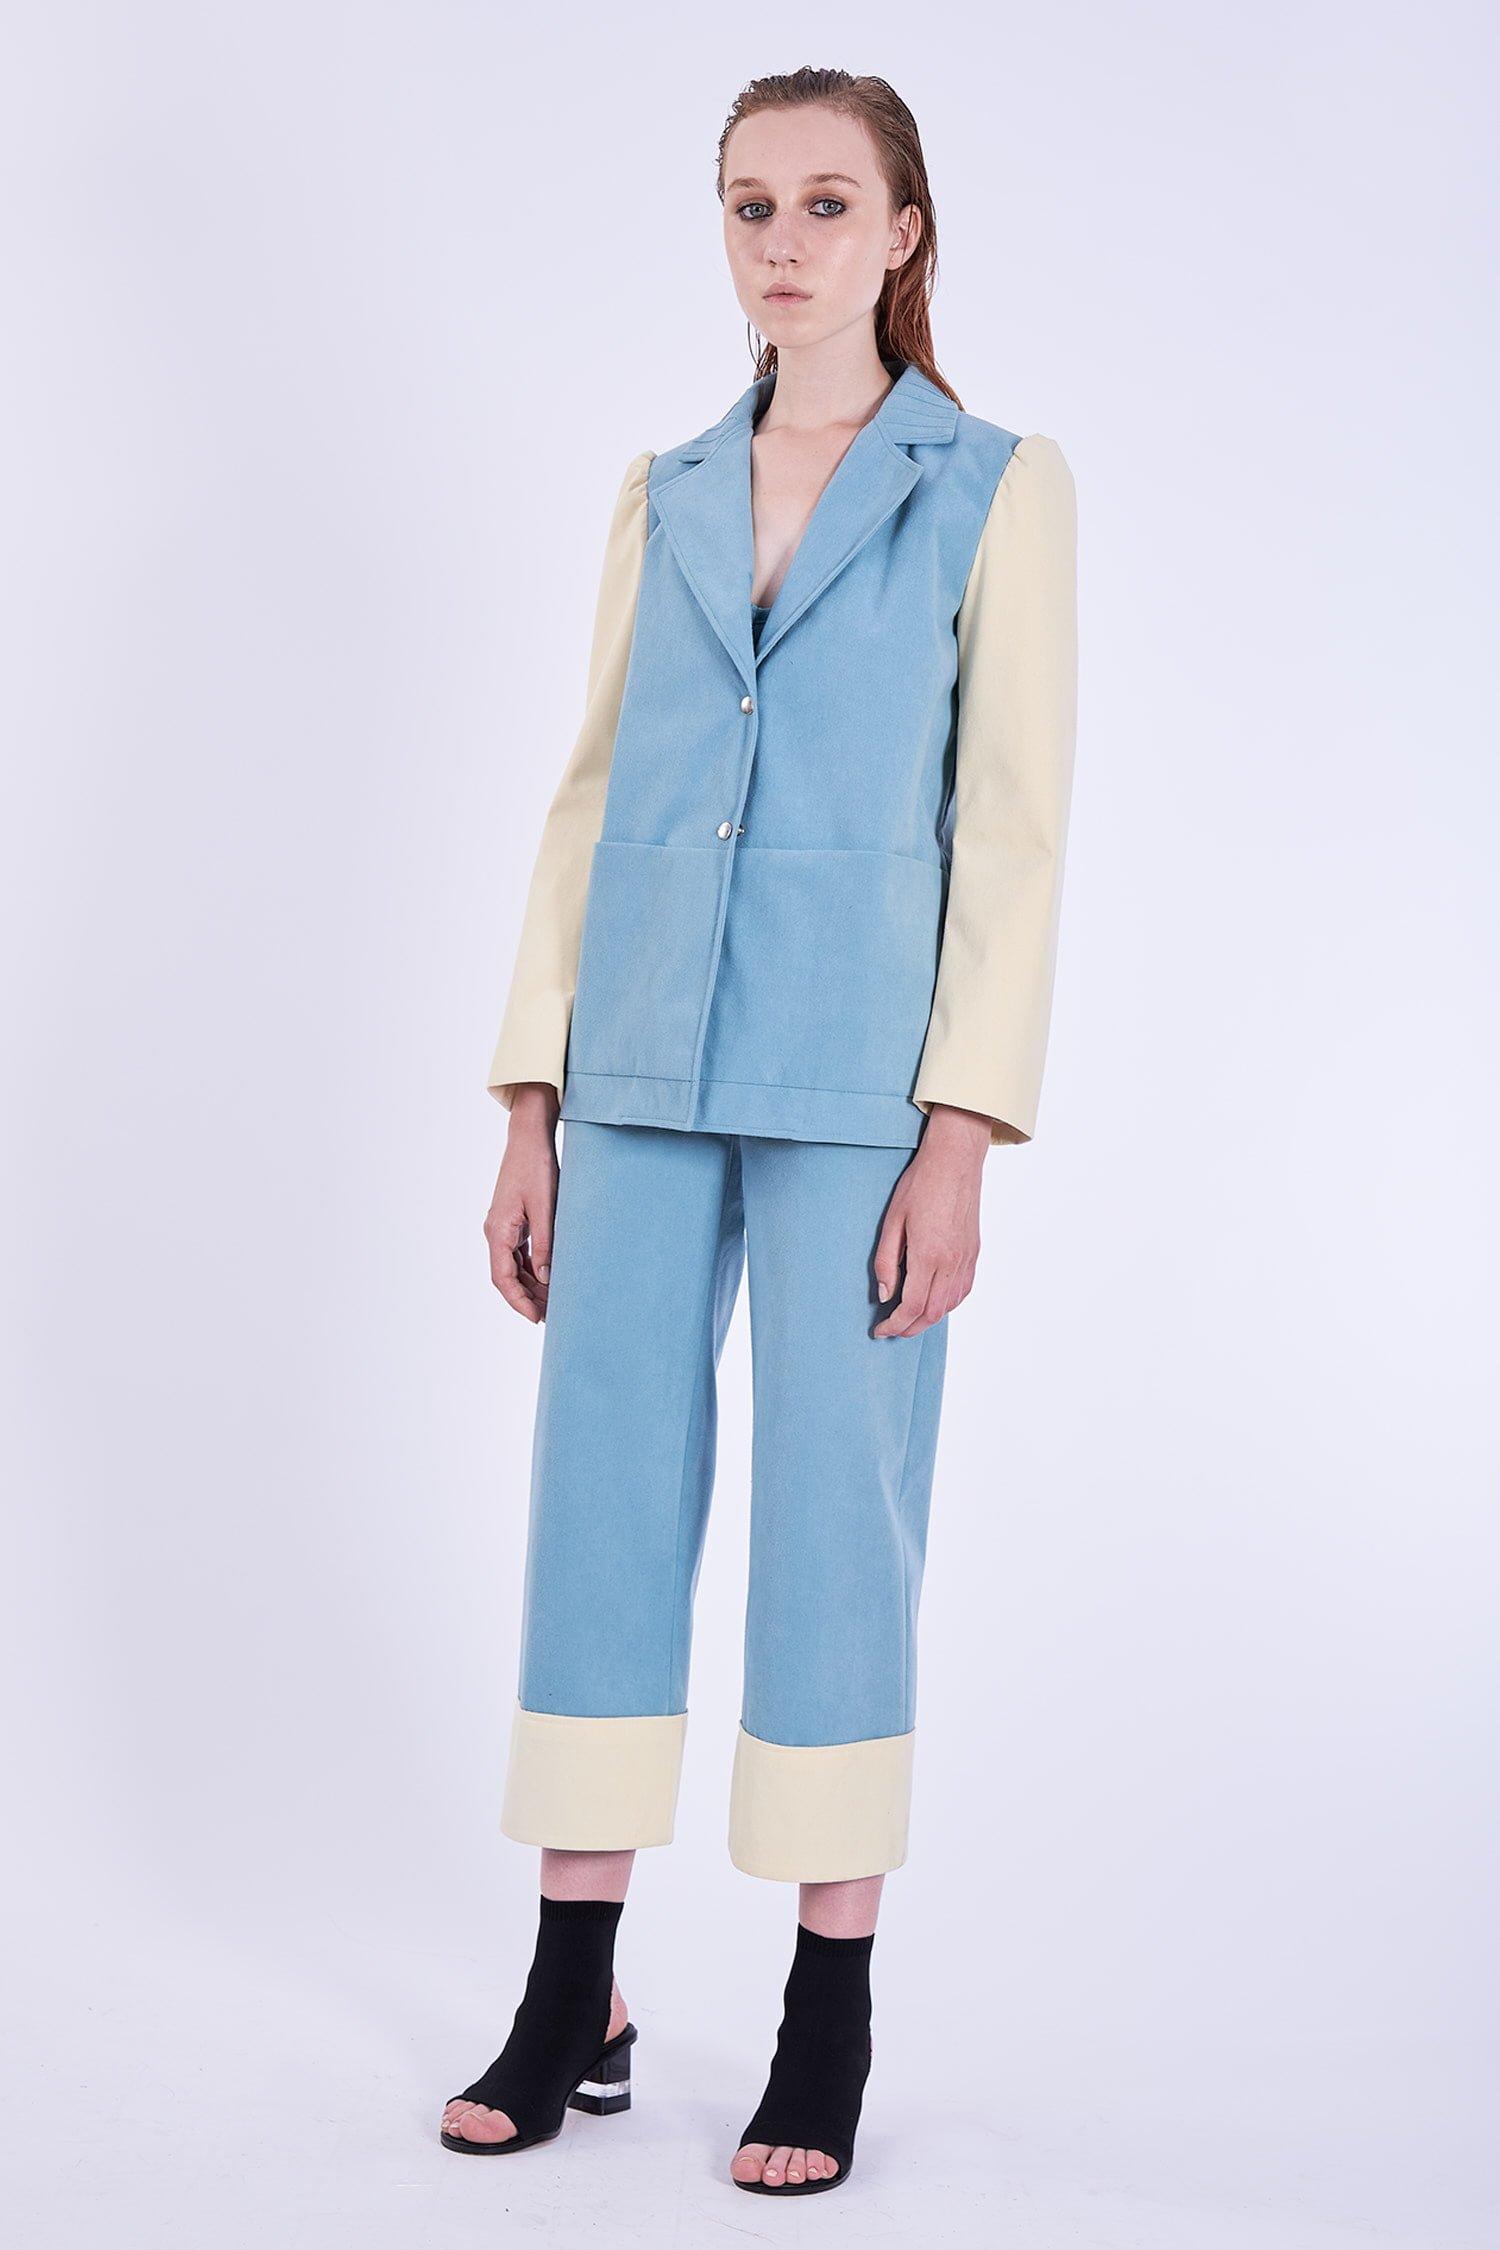 Acephala Ps2020 Blue Suit Suade Alcantara Blekitny Garnitur Side